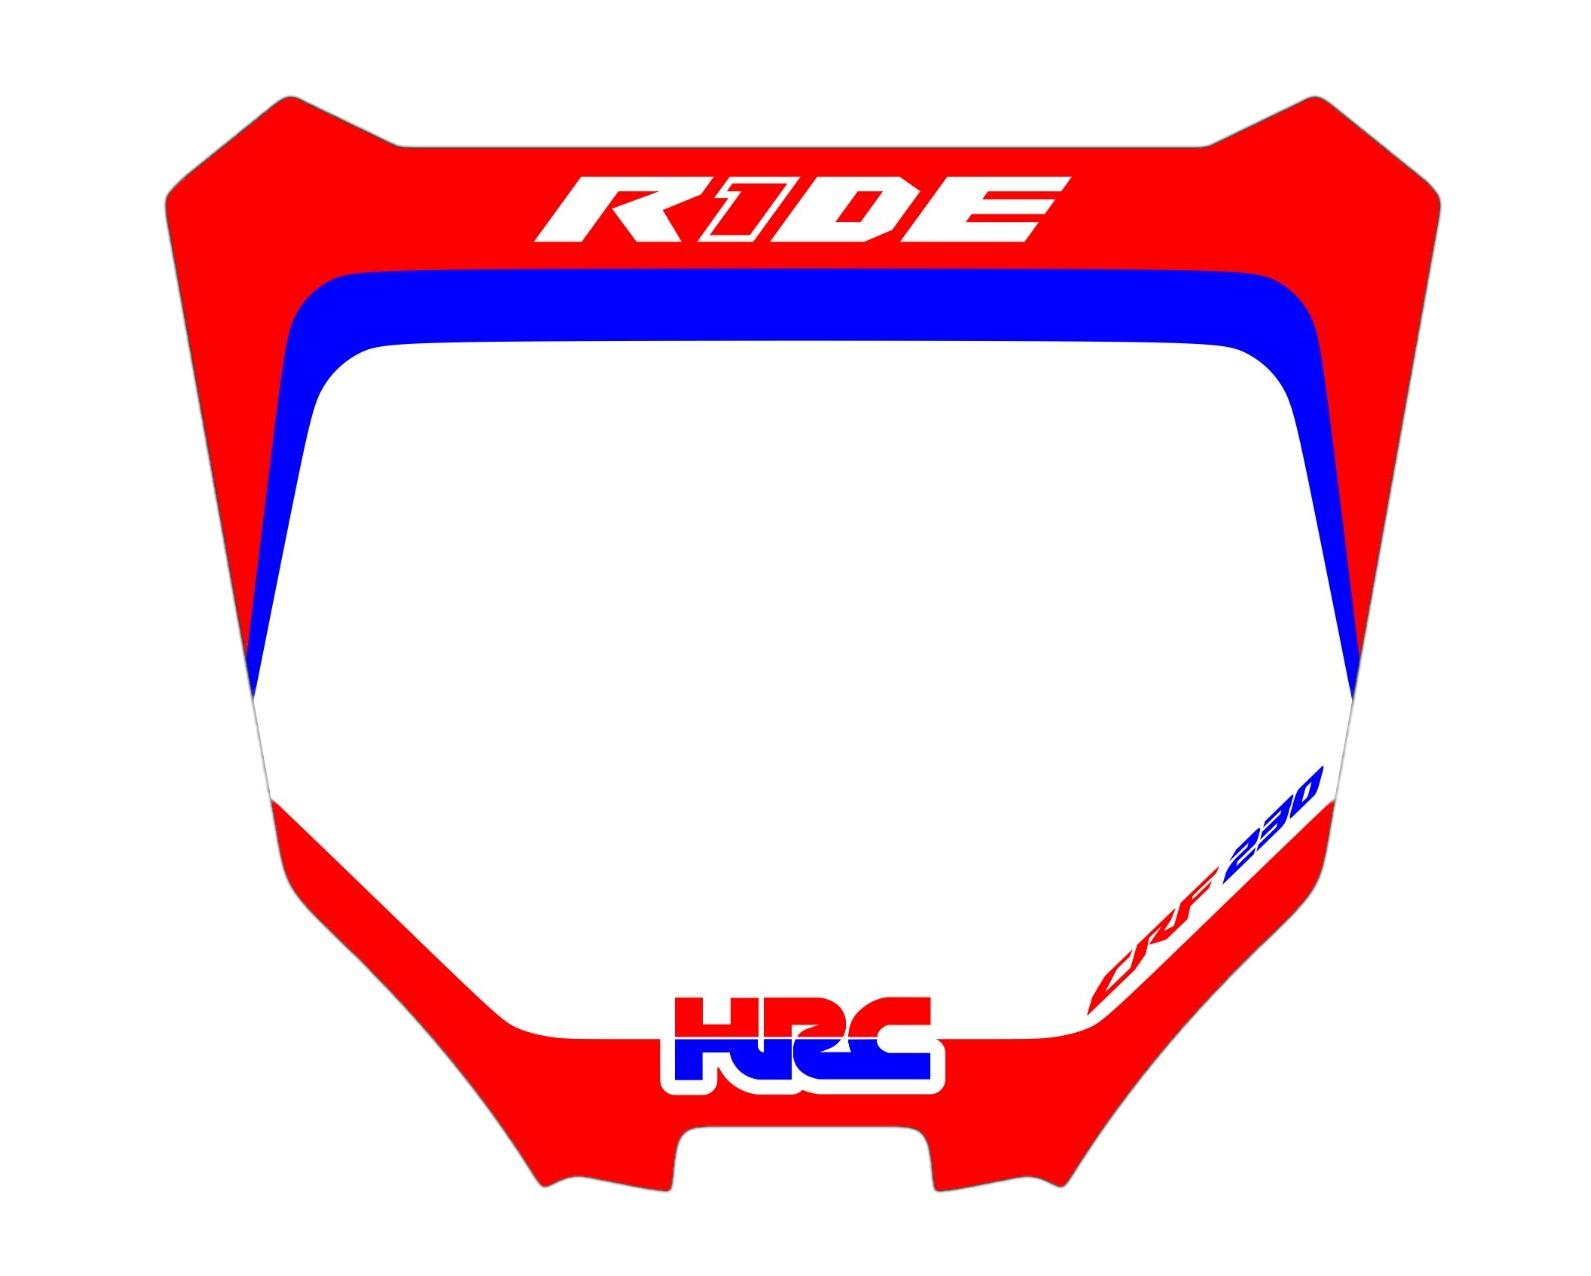 Adesivo Take Number Plate Biker R1de Crf 230